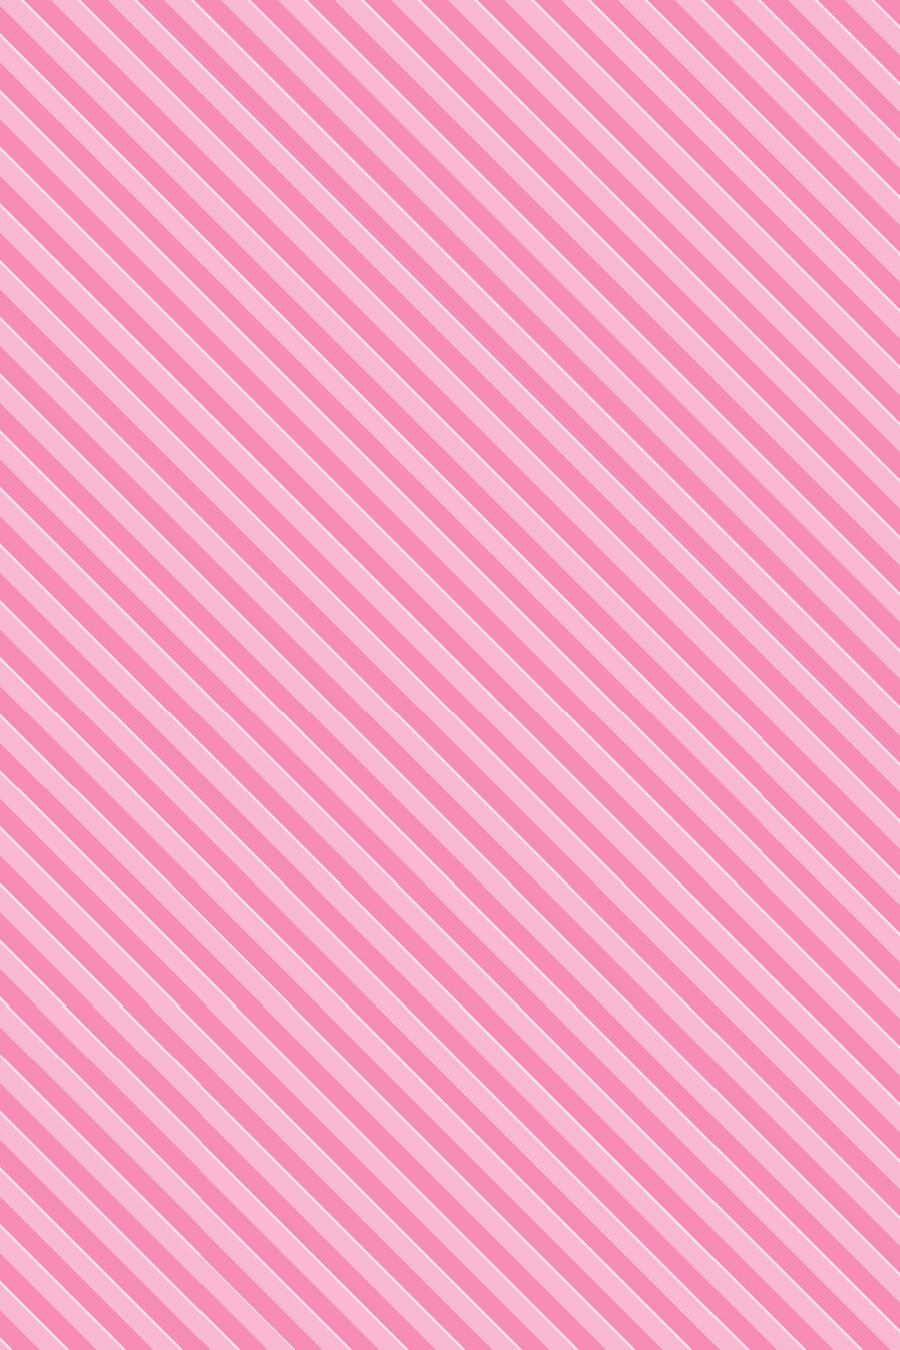 Pink Candy Stripes - CBB by Kyramy